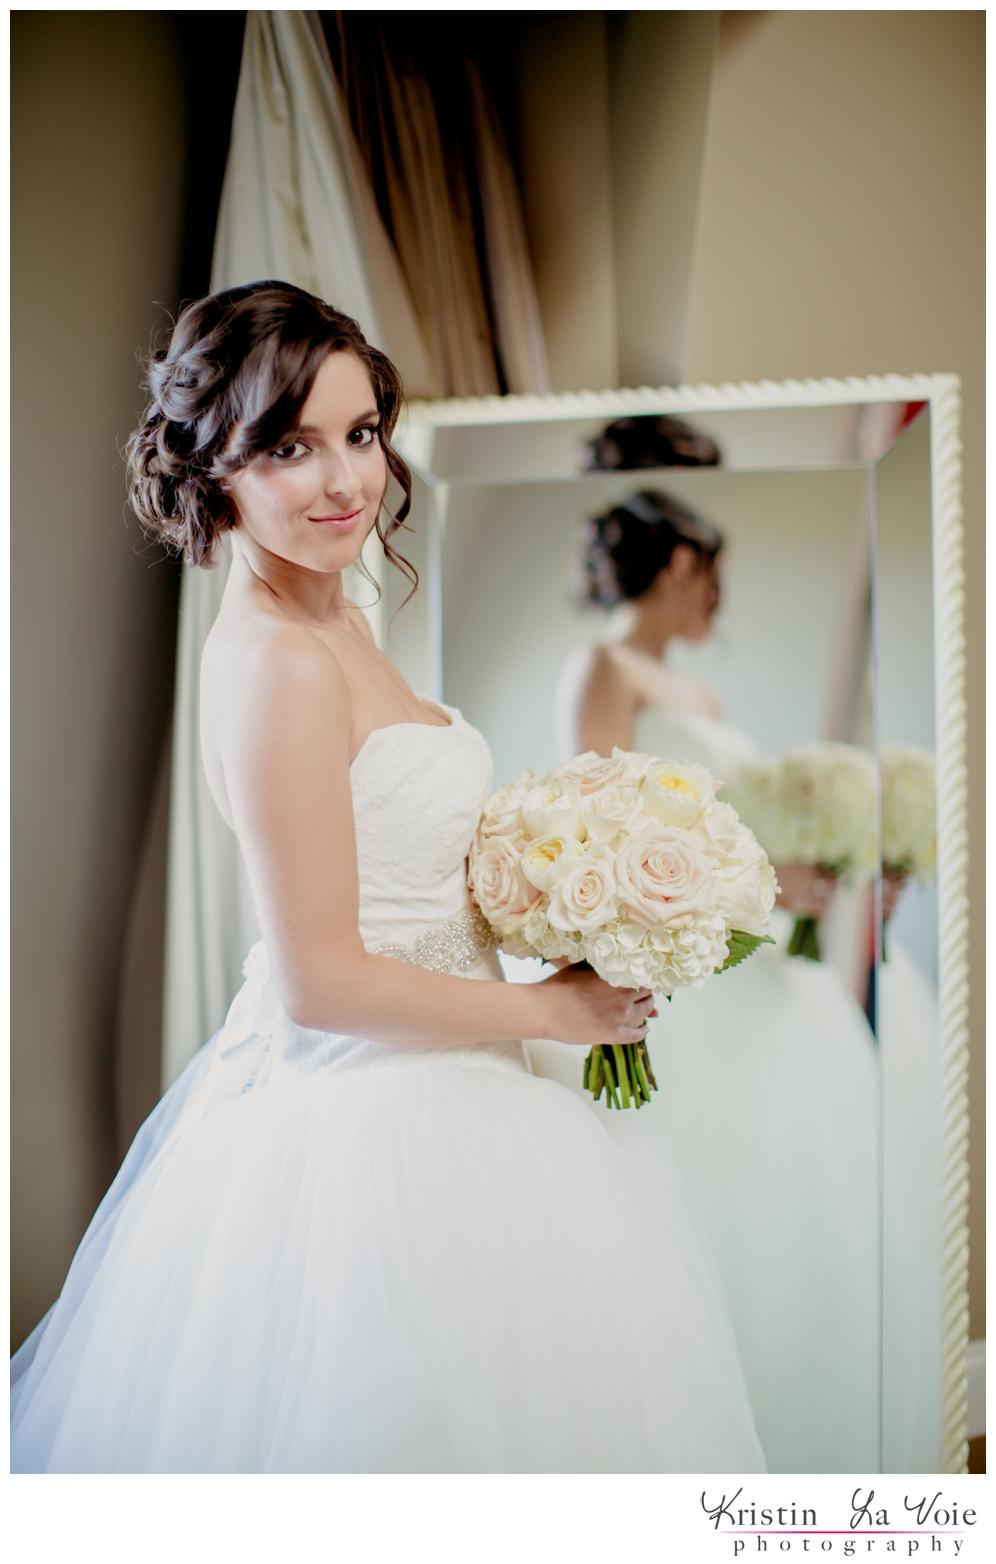 Kristin-La-Voie-Photography-Chicago-Wedding-Photographer-Blackstone-Renaissance-132.jpg